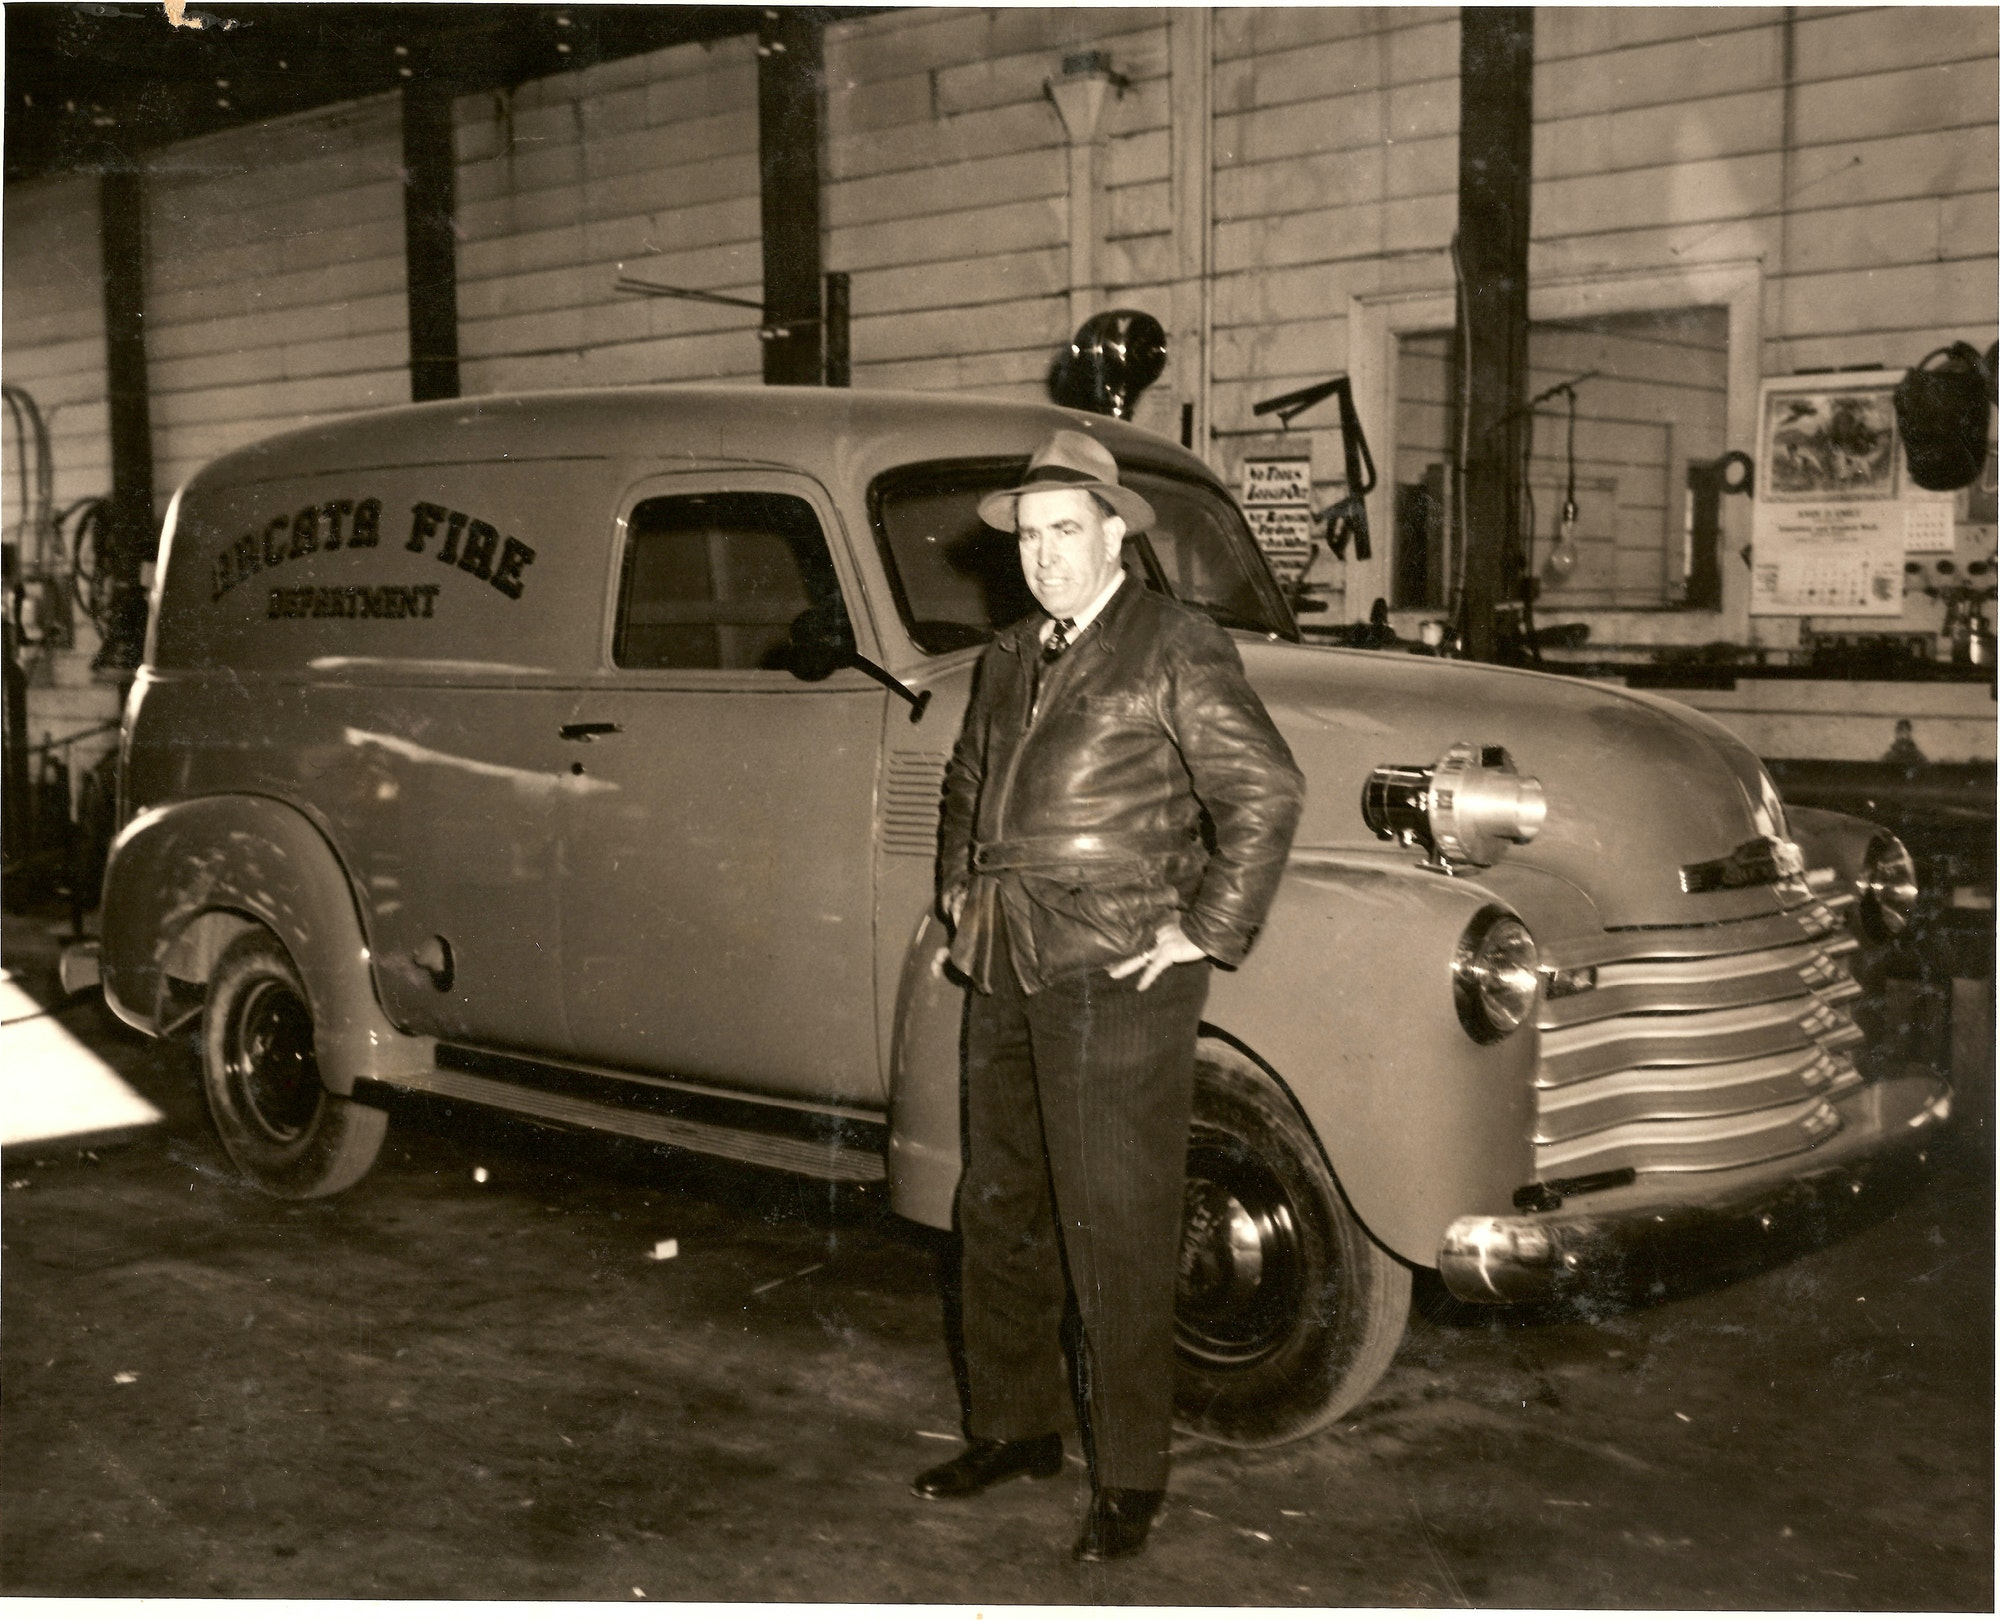 Chief Wyatt standing by Rescue Truck